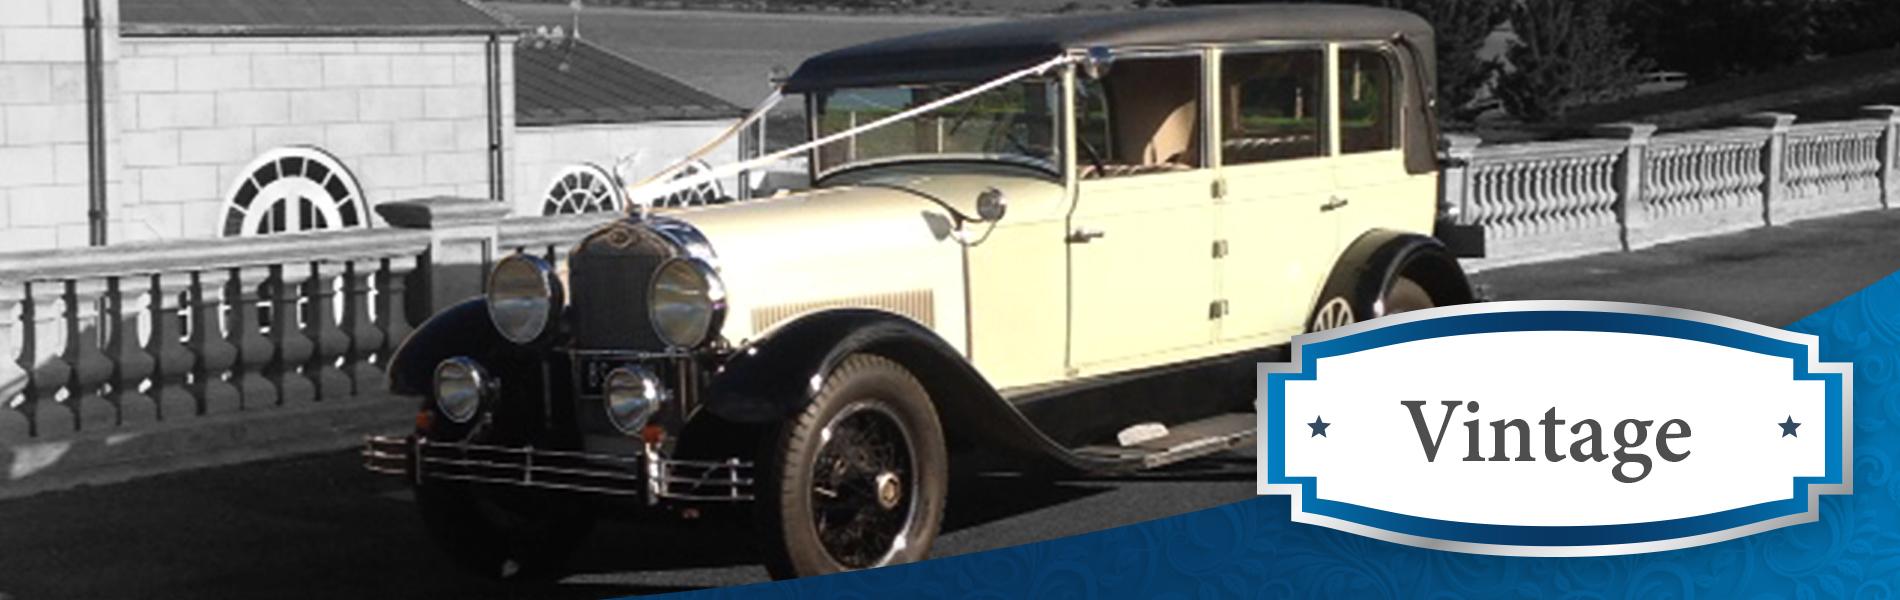 Wedding Cars and Wedding Transport Melbourne